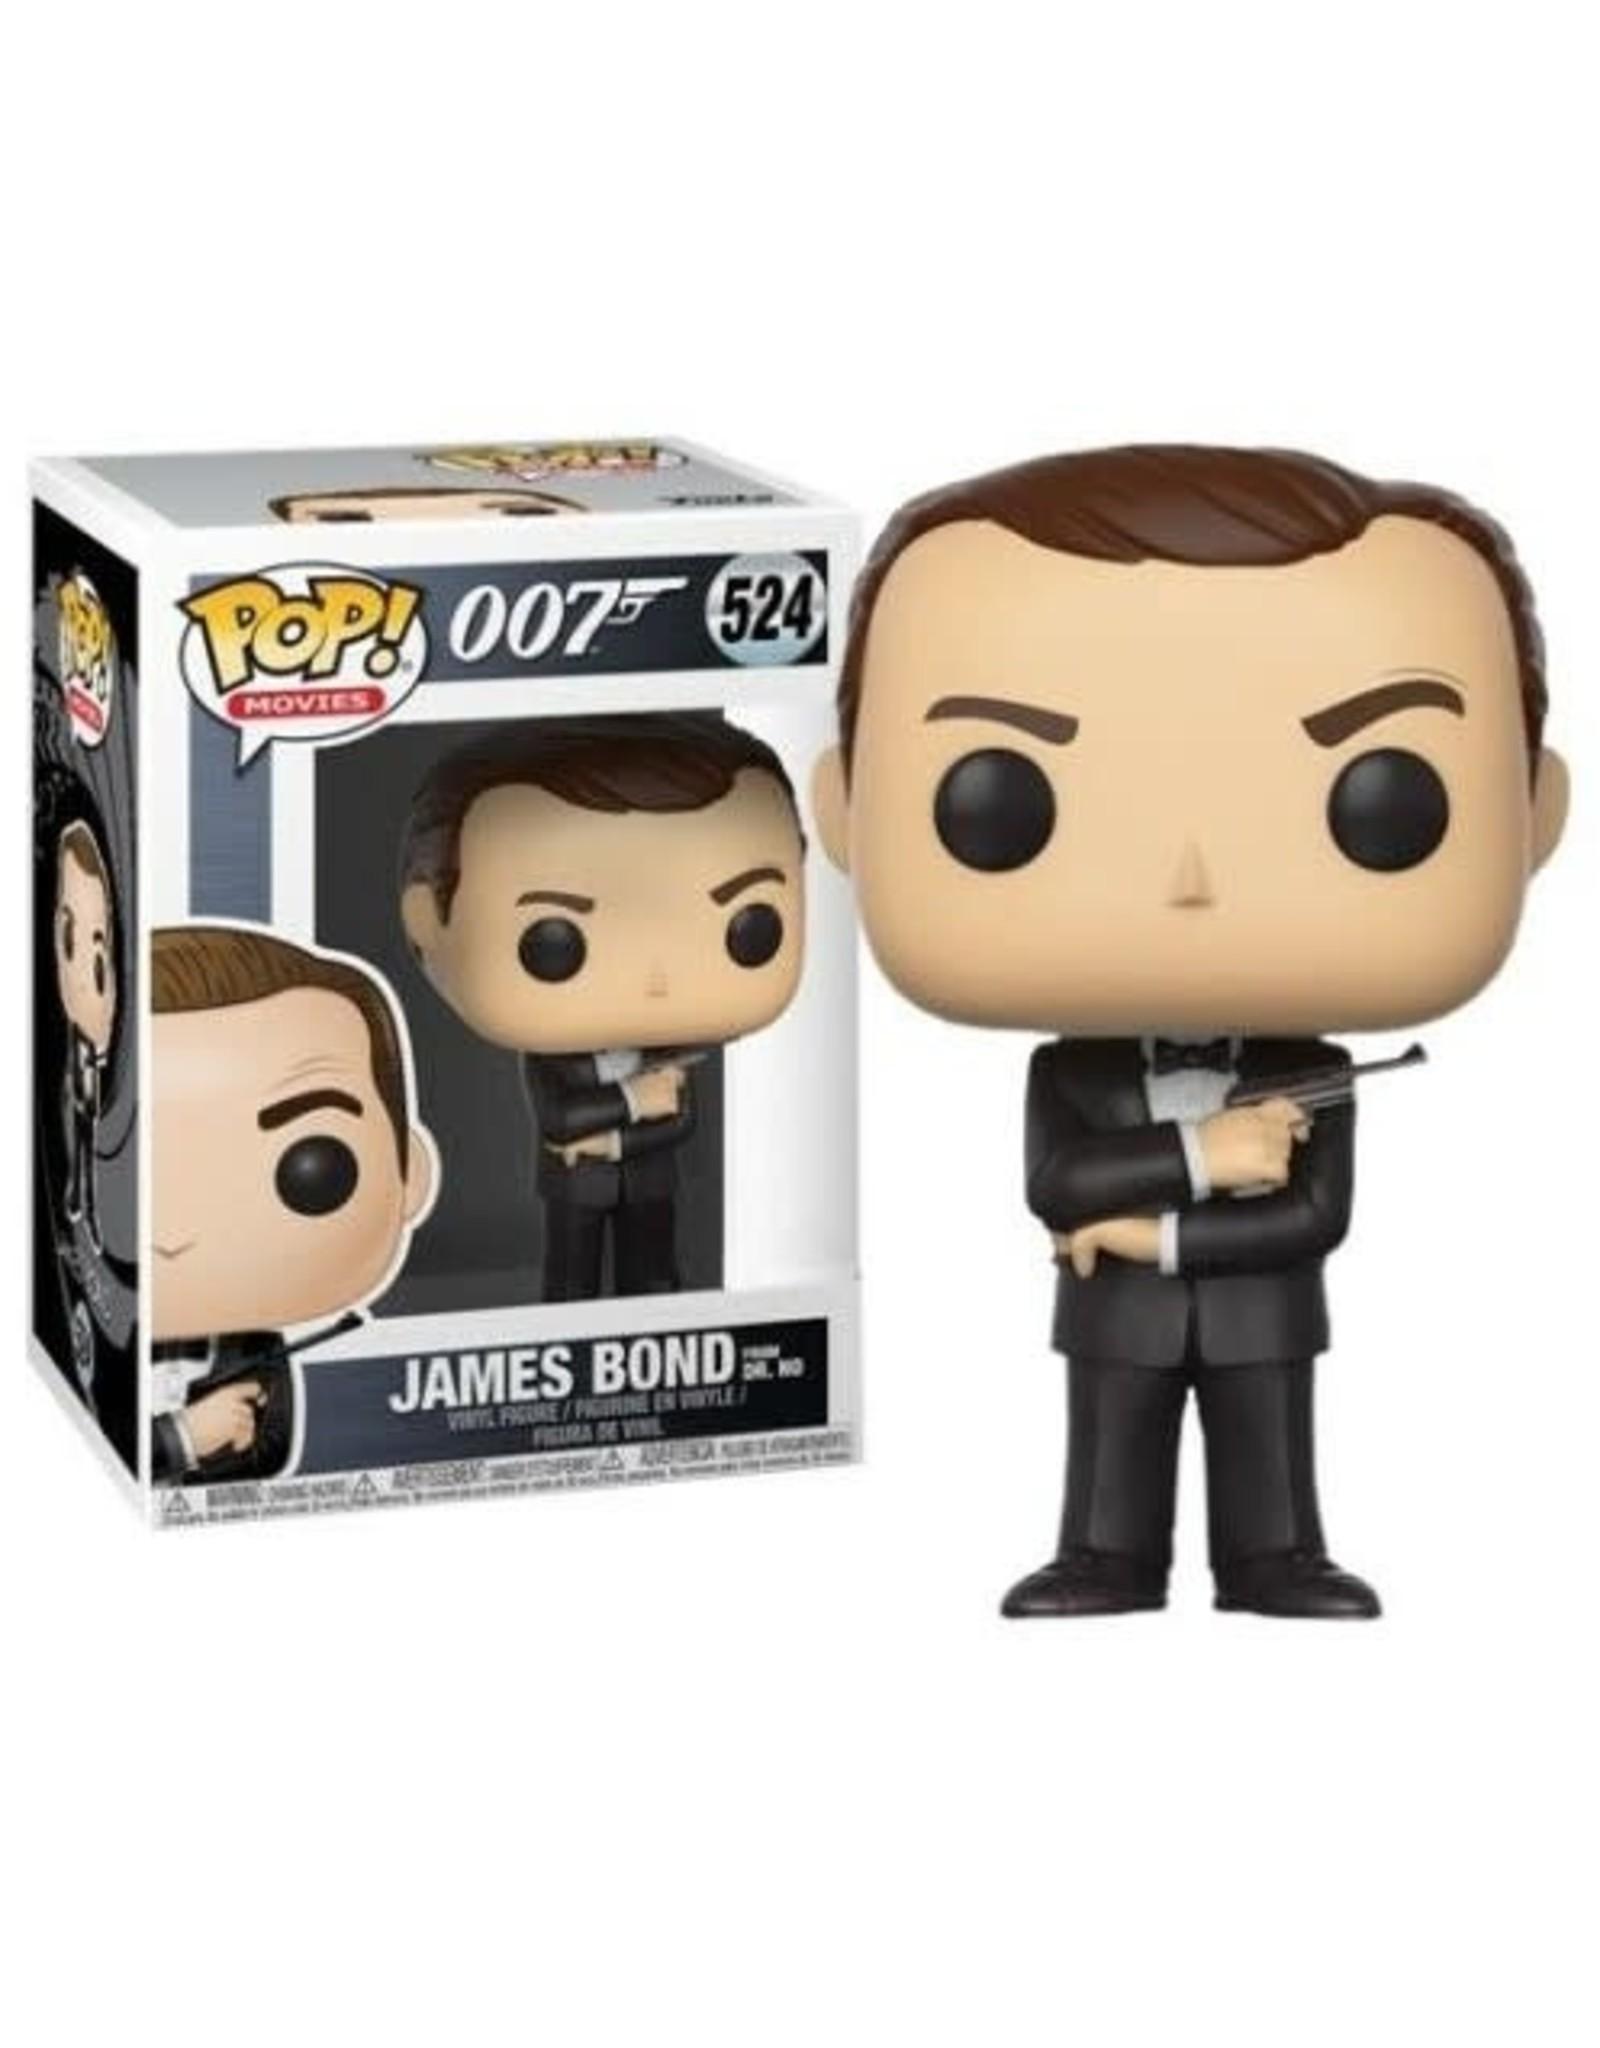 Funko Pop! Funko Pop! Movies nr524 Dr. No - James Bond